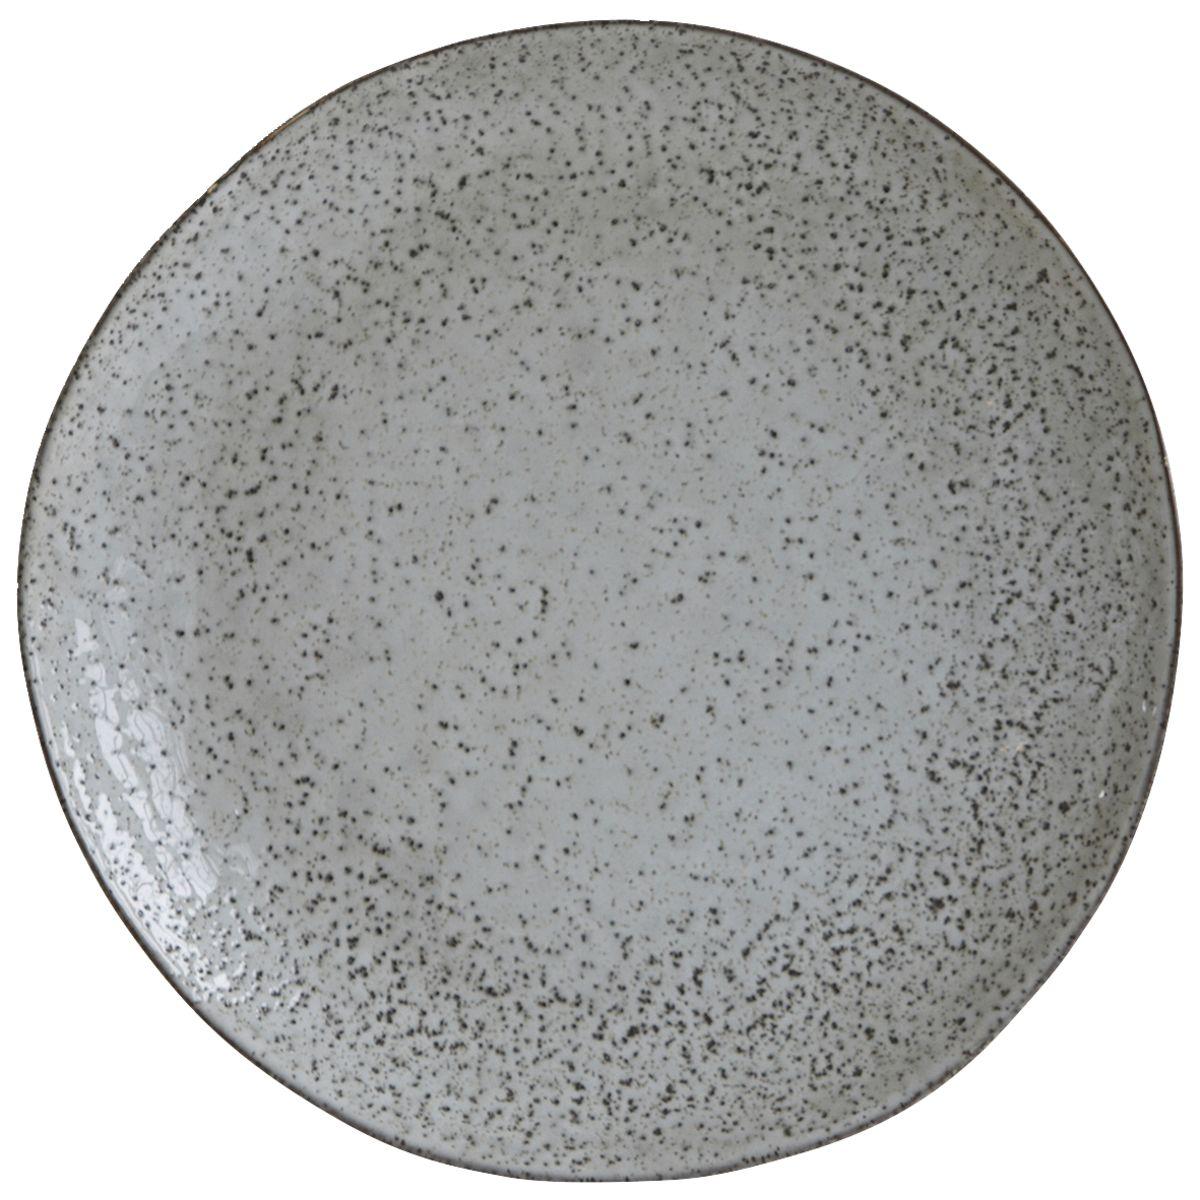 House Doctor Rustic middagstallerken, Ø27,5 cm, gråblå